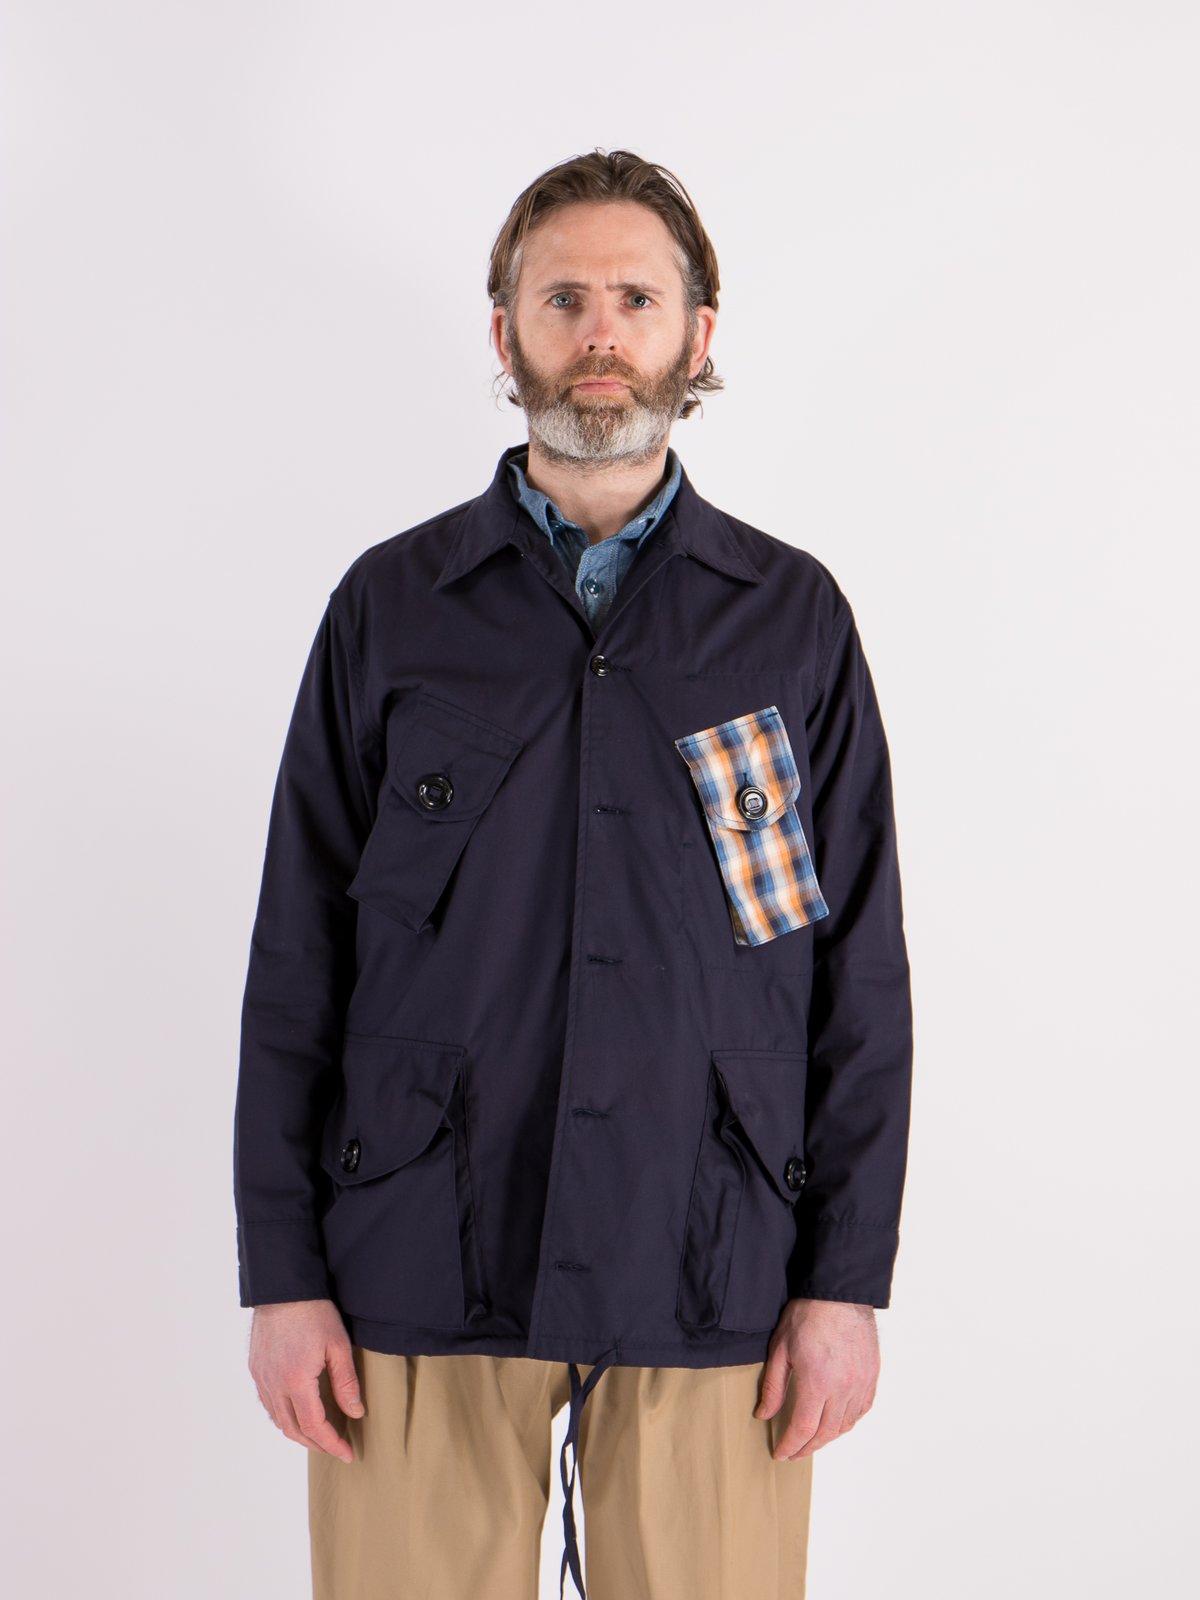 Navy Vancloth Oxford Military Half Coat Type B Exclusive - Image 2